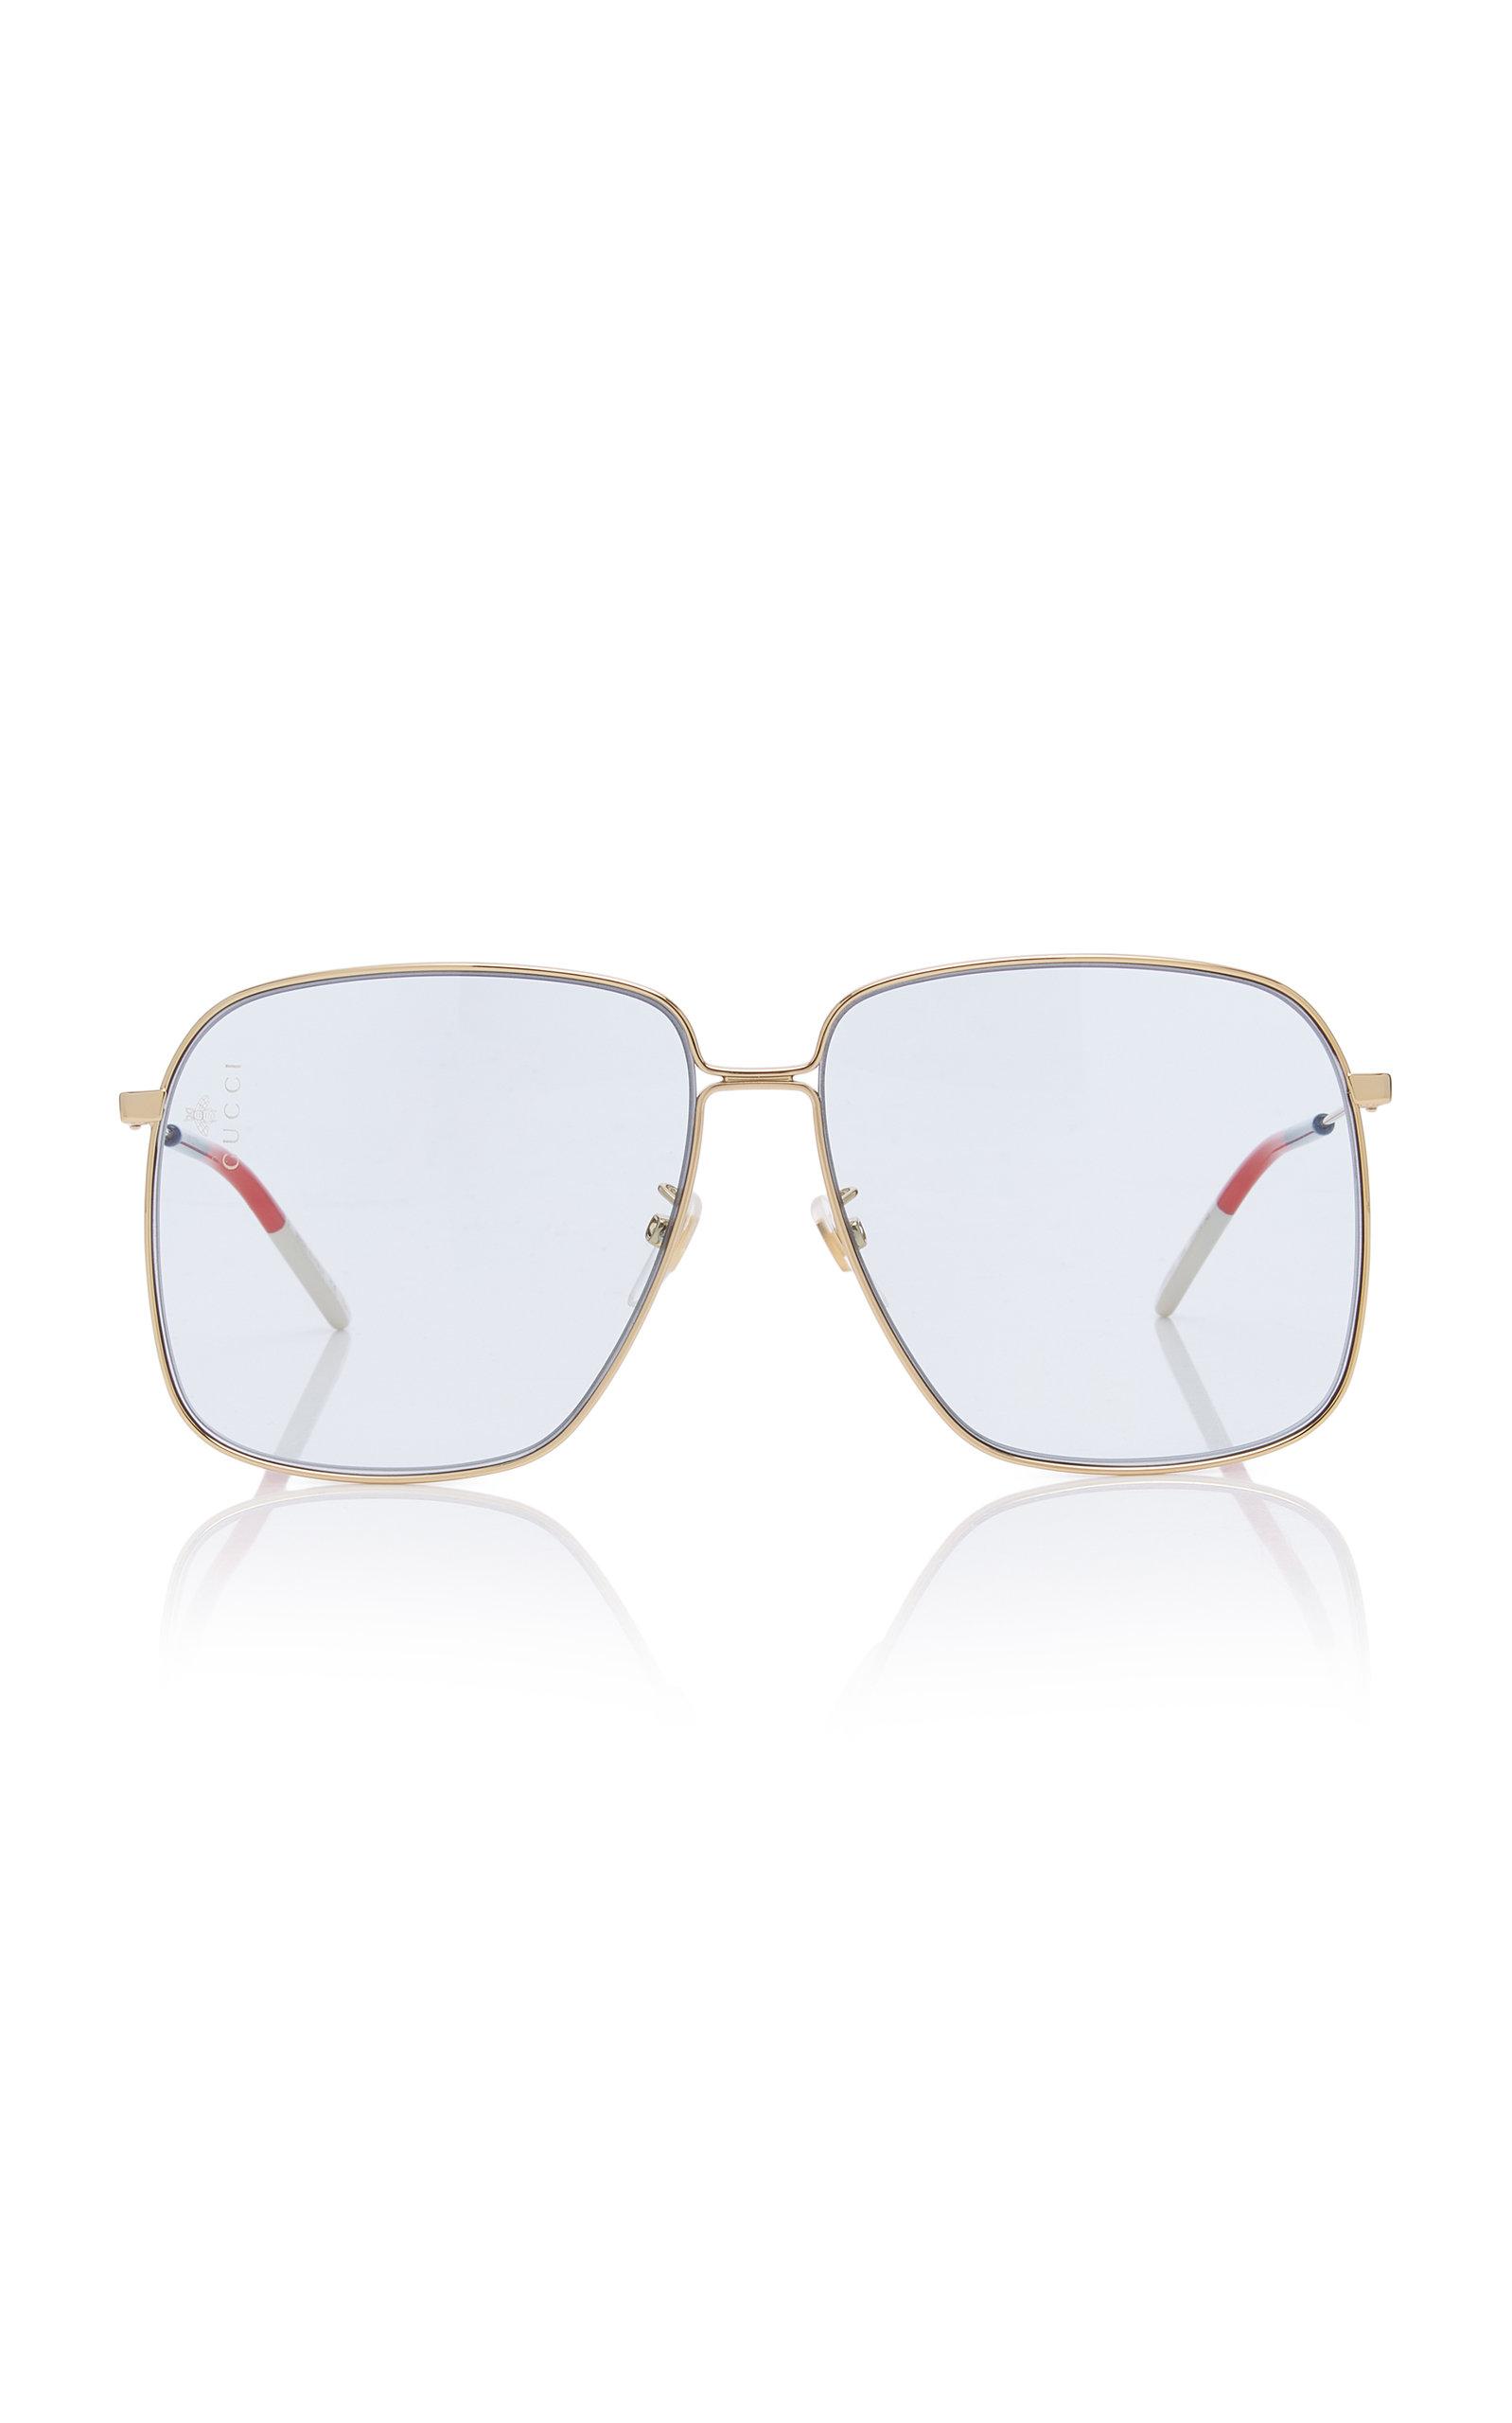 2c3545a8b0f6 Glasant Oversized Metal Square-Frame Sunglasses by Gucci | Moda Operandi